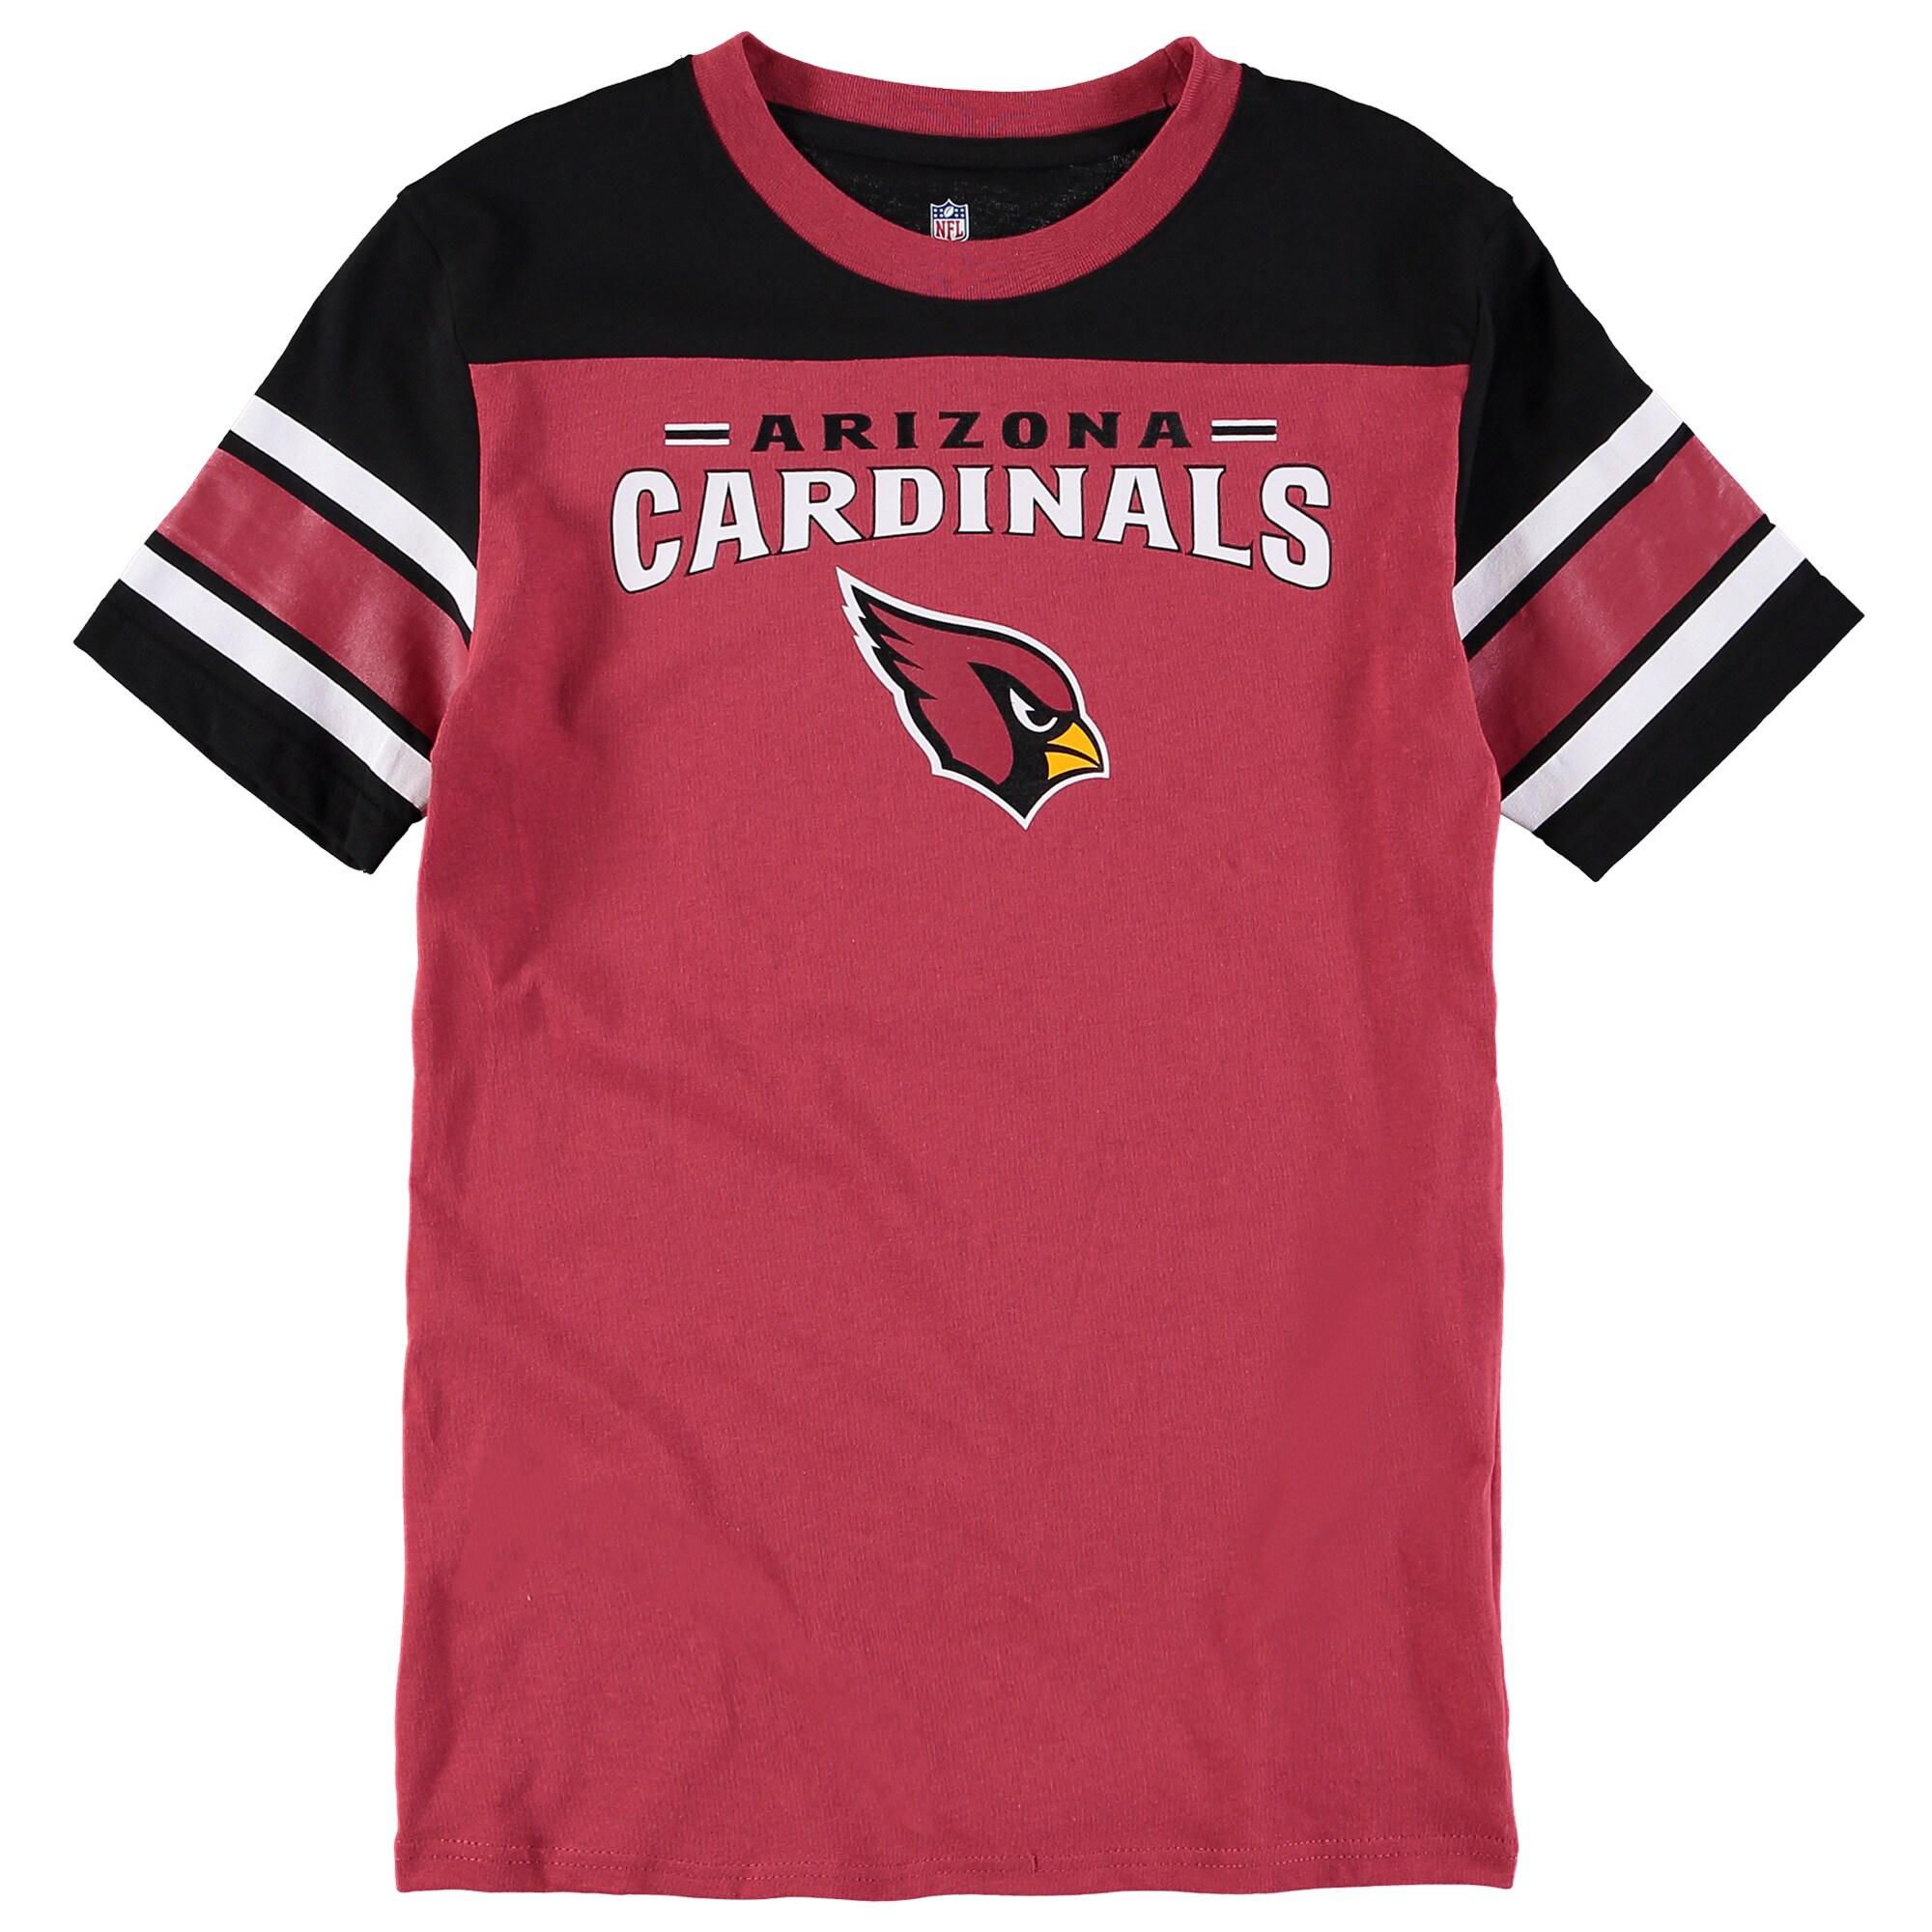 Arizona Cardinals Youth Fan Gear Loyalty T-Shirt - Cardinal